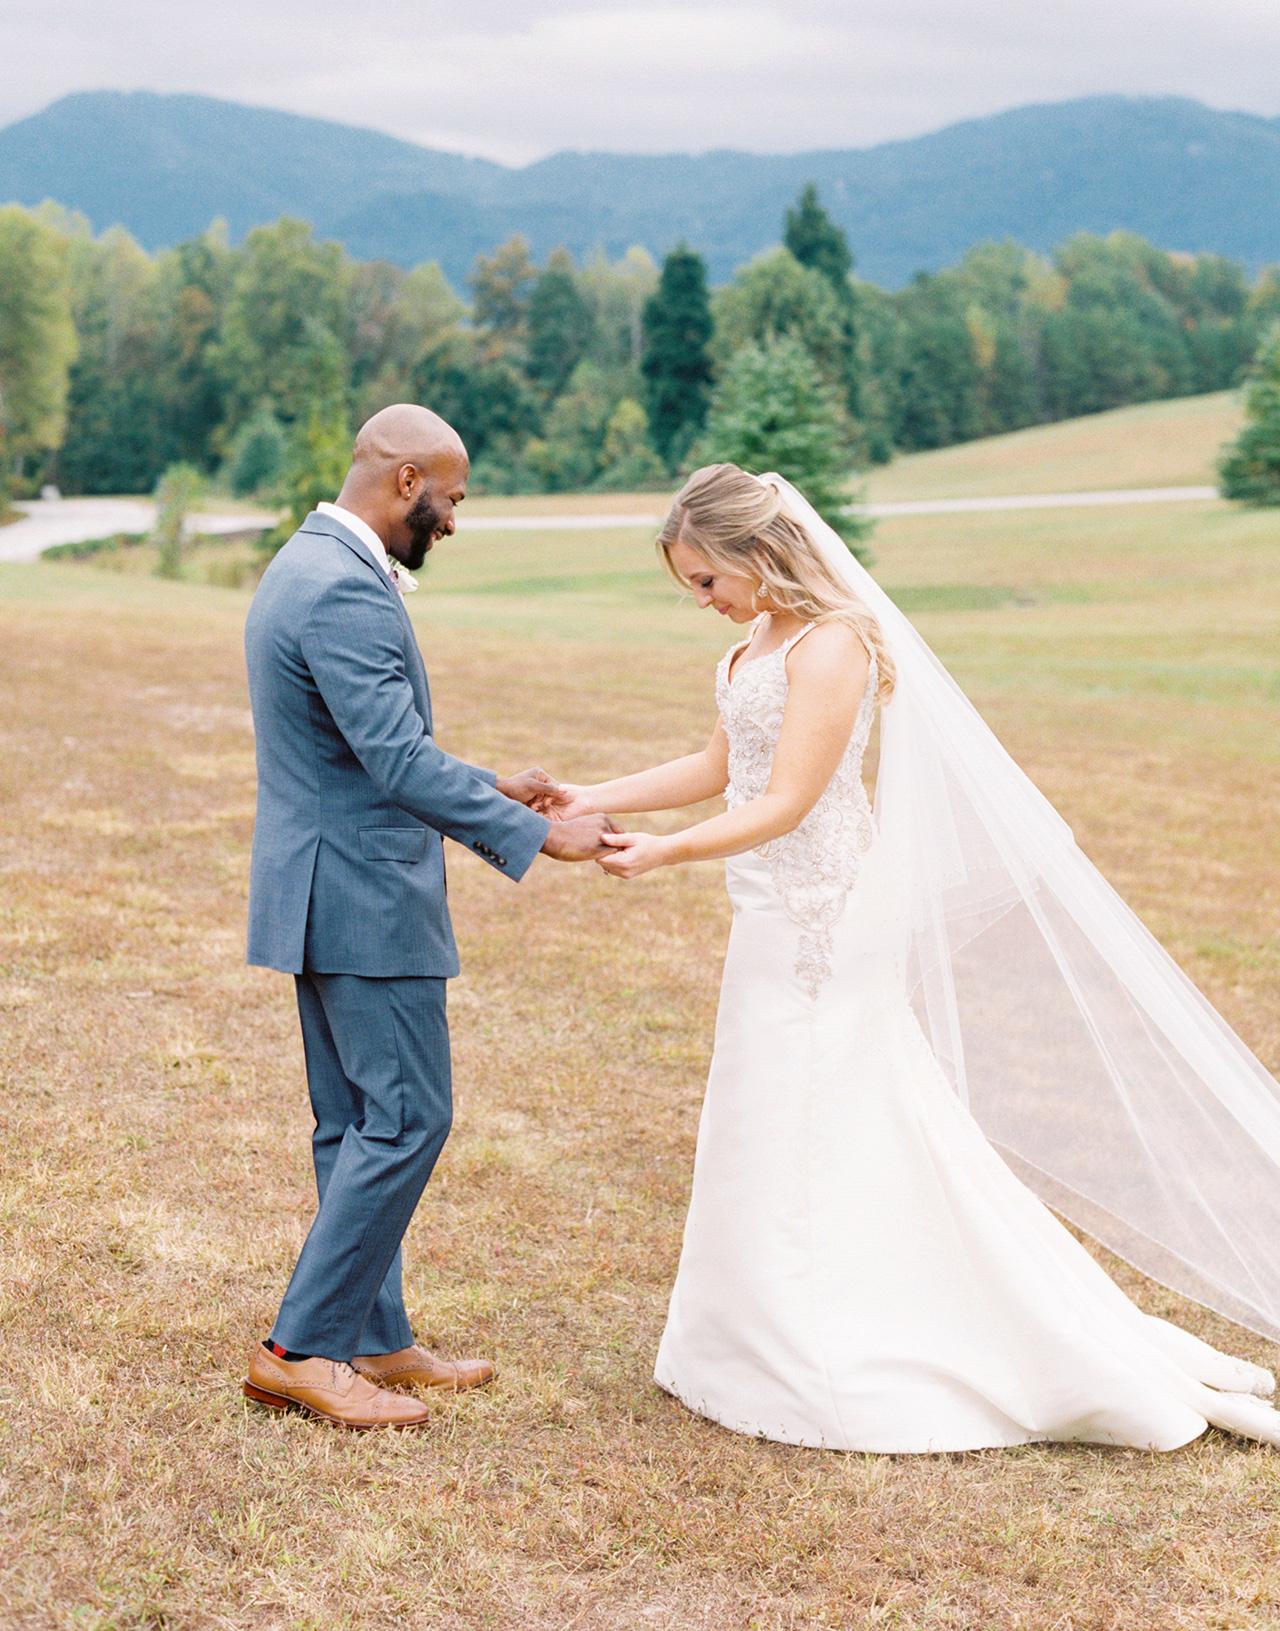 bride groom wedding first look outdoor mountain view